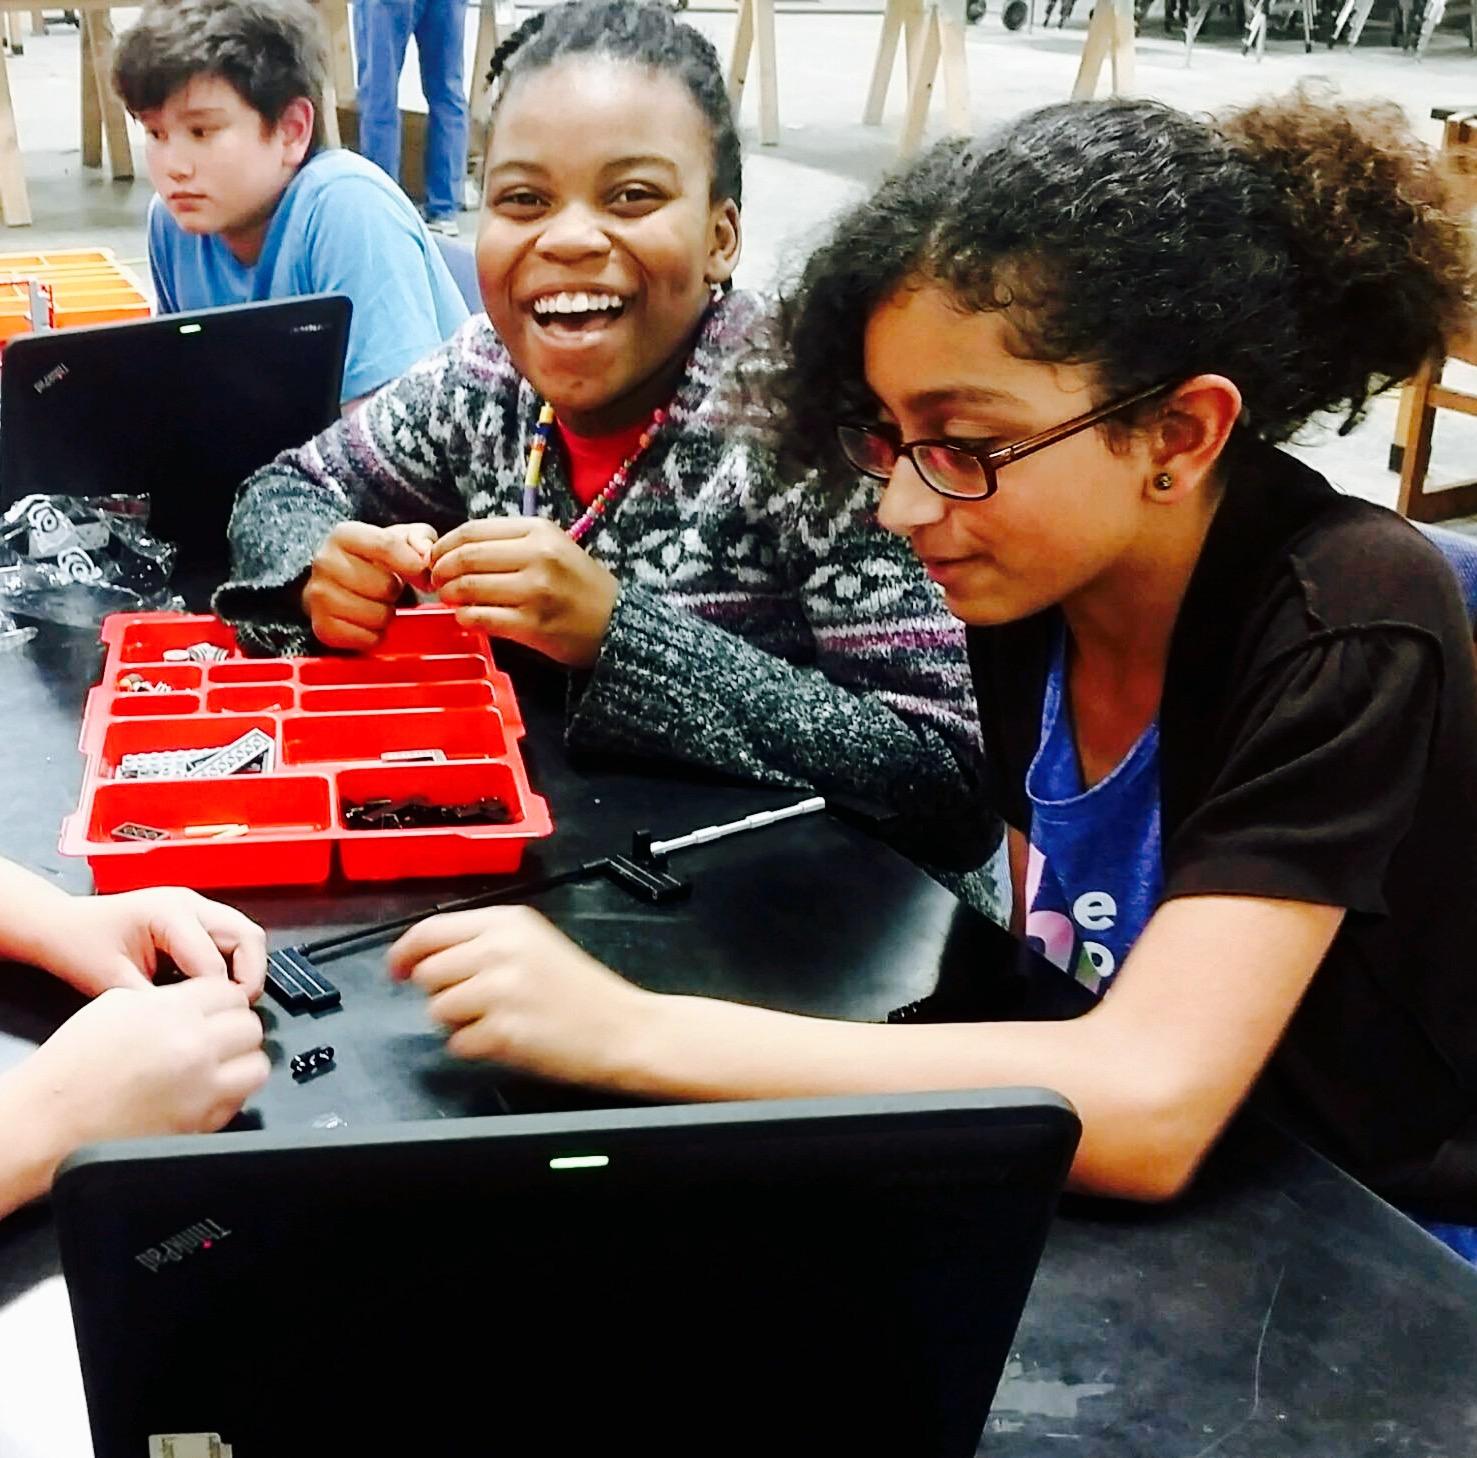 Dayton Stem School: Dayton Regional STEM School News And Events: 13 Signs That